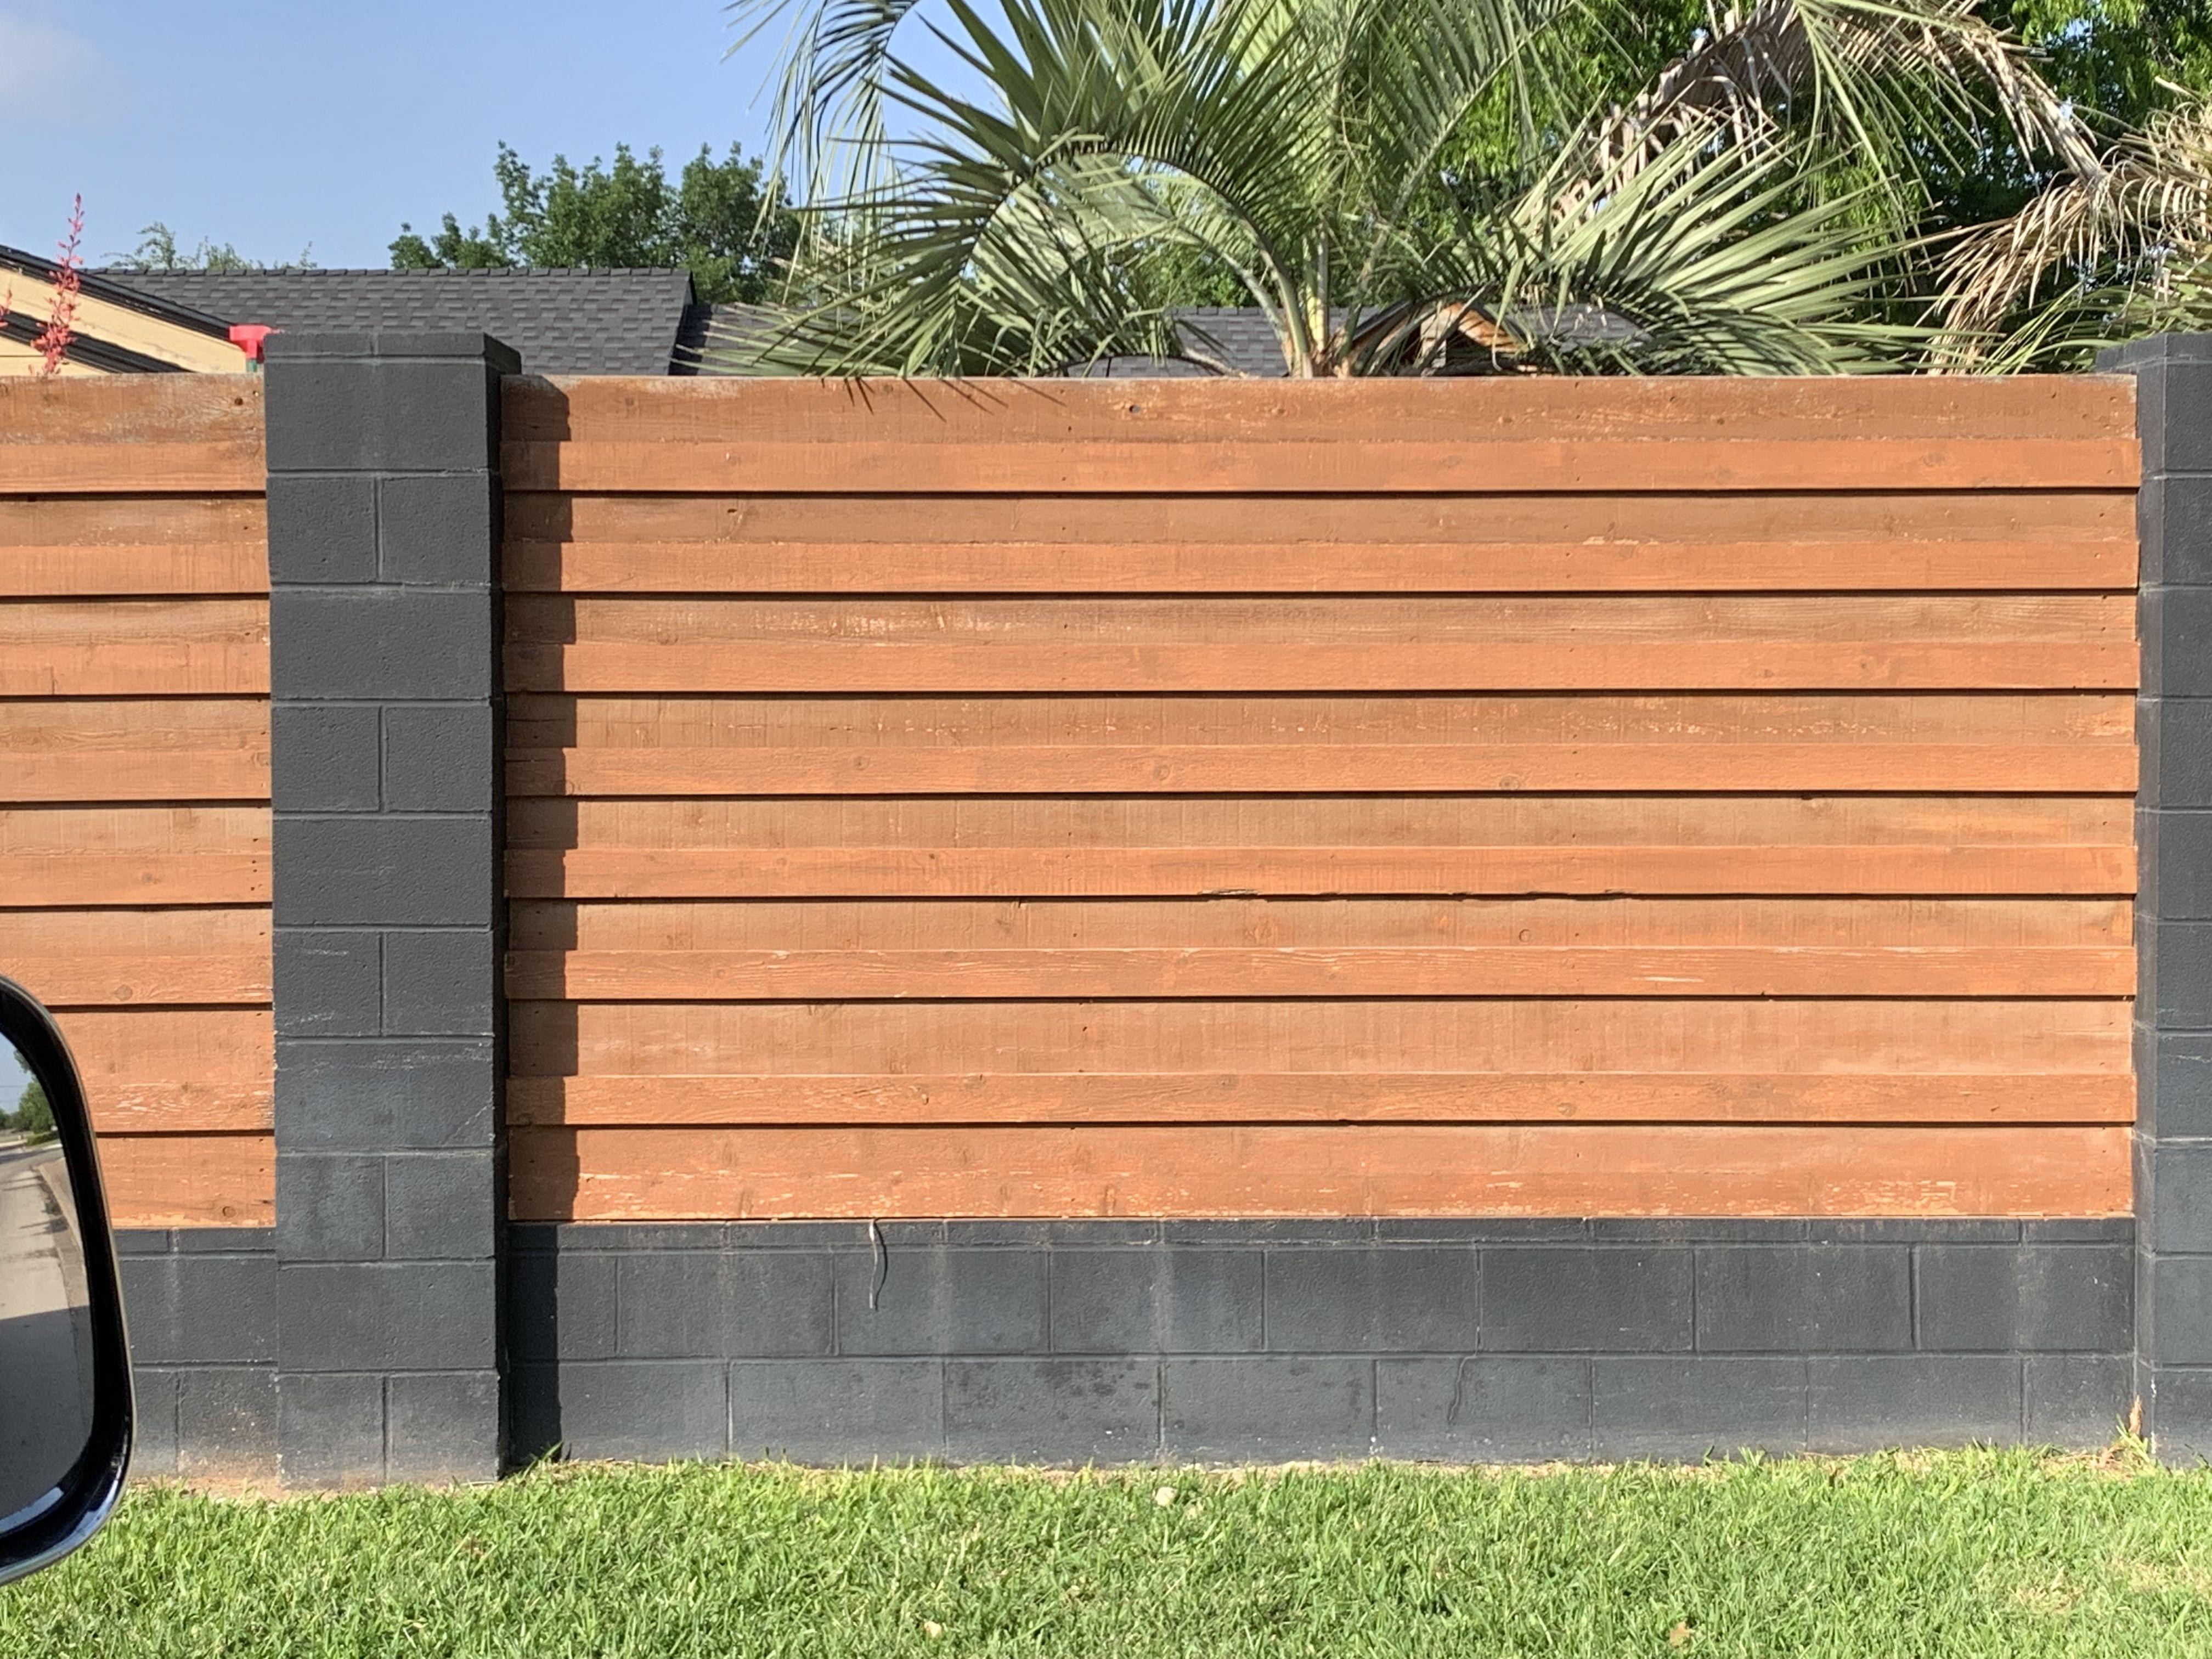 Pin By Robert Ramirez On Fences Outdoor Furniture Outdoor Storage Outdoor Decor